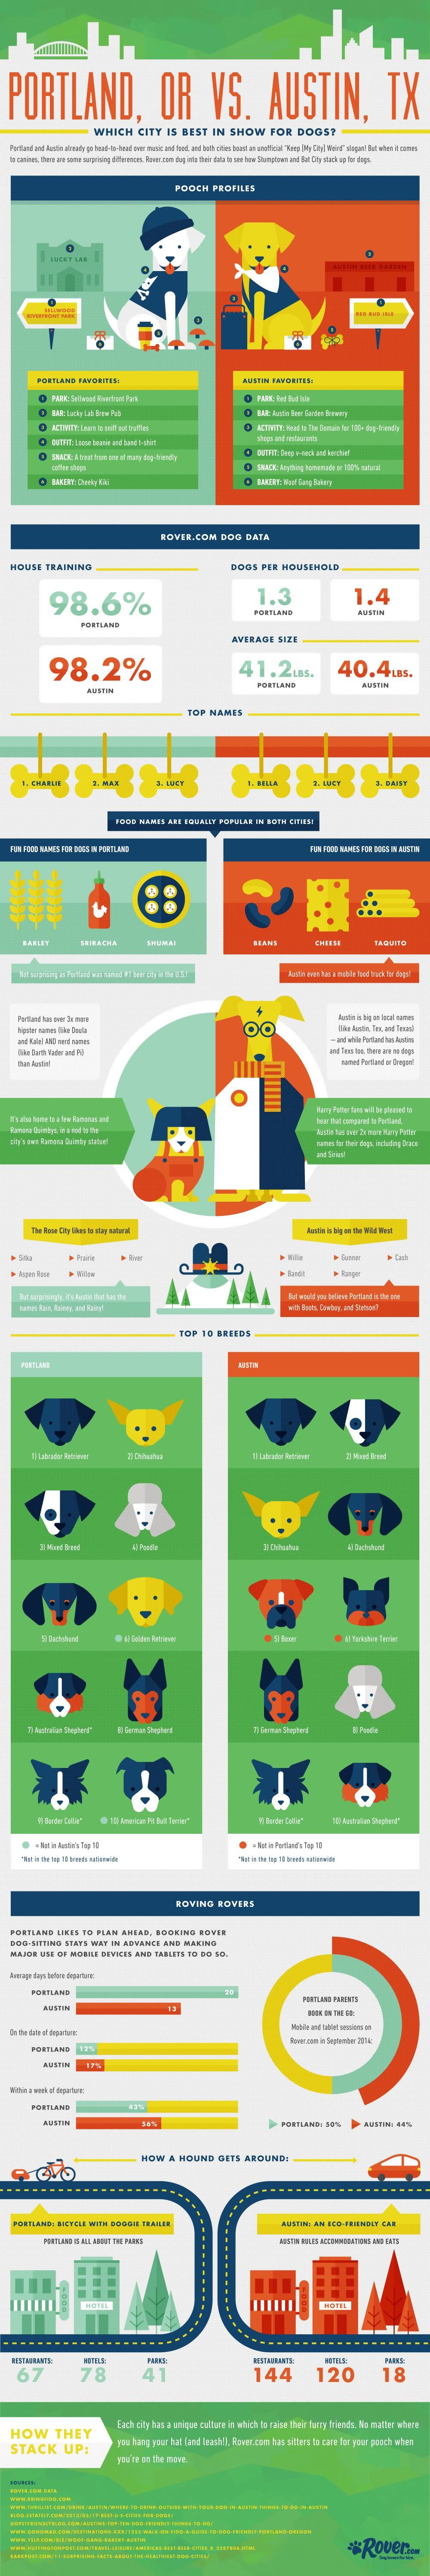 Rover-PortlandVsAustin Infographic